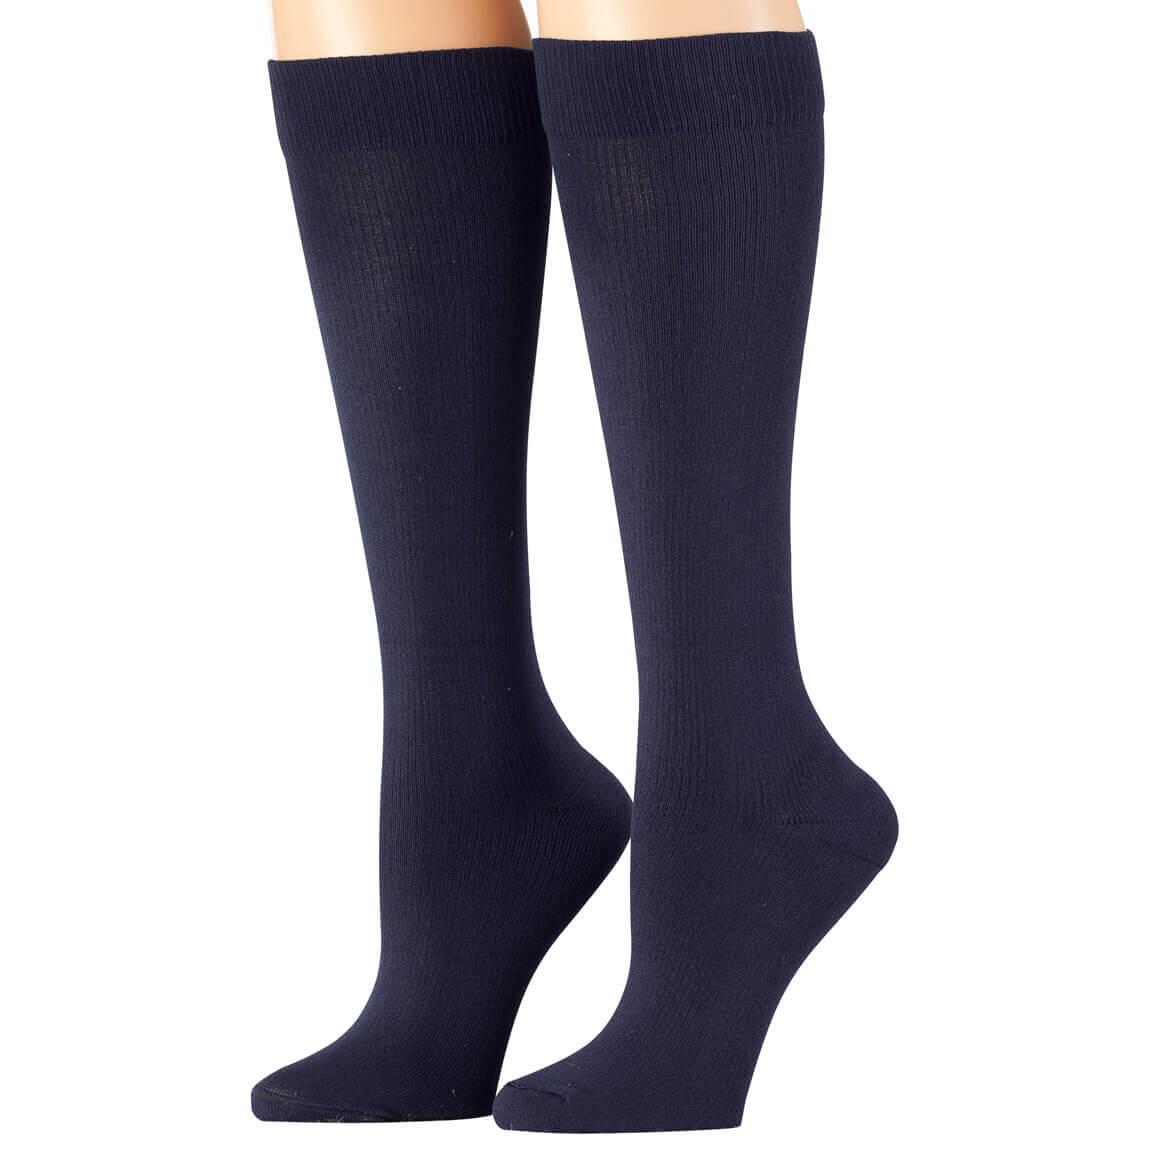 eb363c561c Details about Healthy Steps Compression Socks 15-20 mmHg, Navy Blue, SM